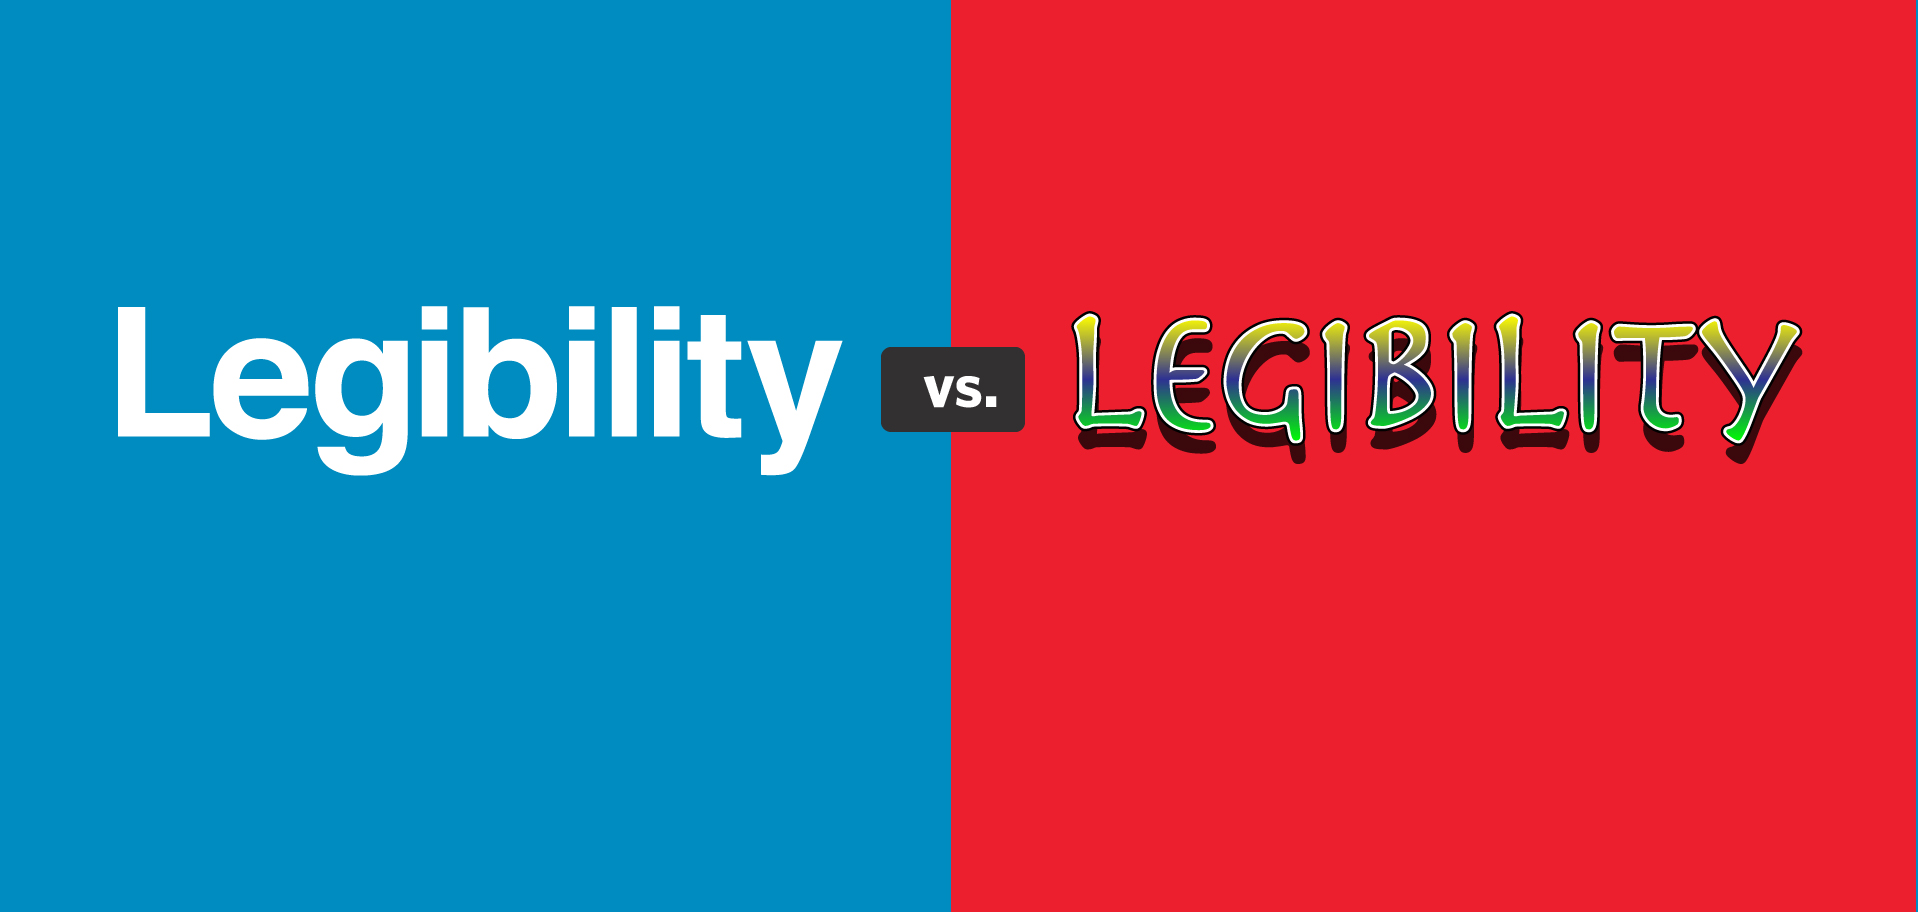 Legibility = Speed of Understanding Blog Kettle Fire Creative consistent communication legibility Legibility = Speed of Understanding legibility speed of understanding fi